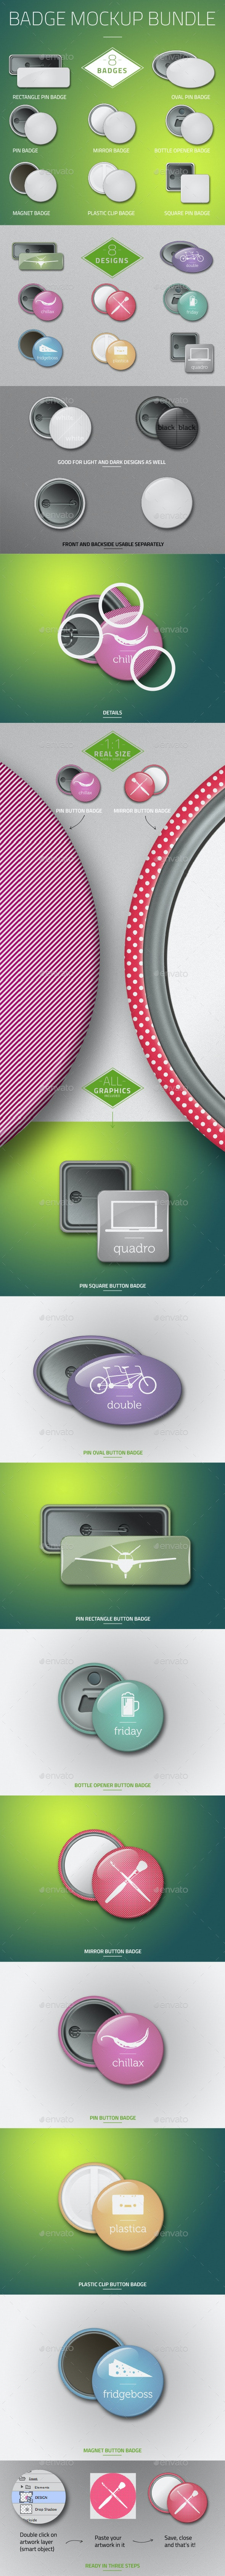 Button Badge Mockup Bundle - Product Mock-Ups Graphics